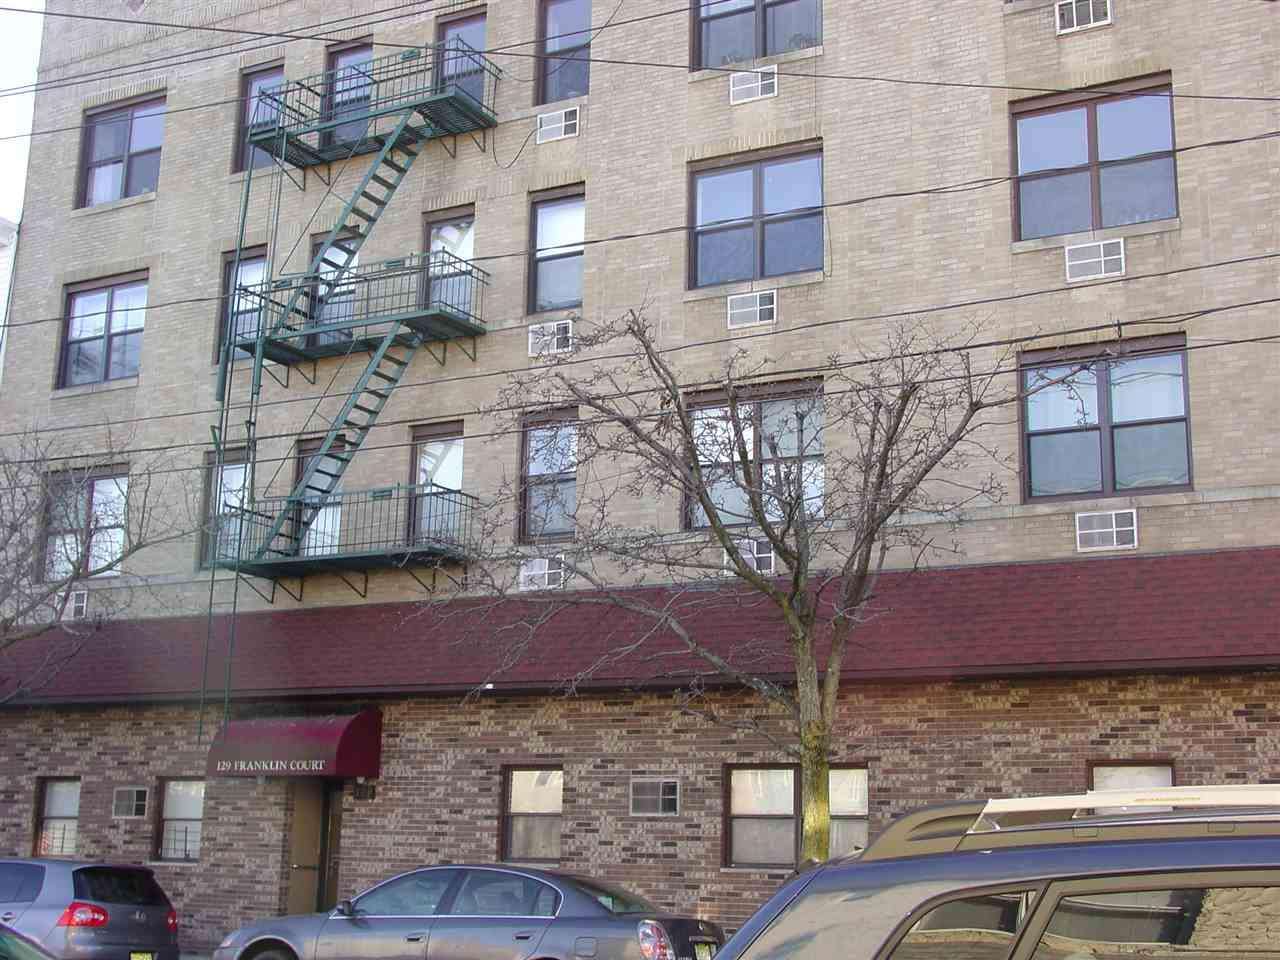 129 FRANKLIN ST C2, JC, Heights, NJ 07307